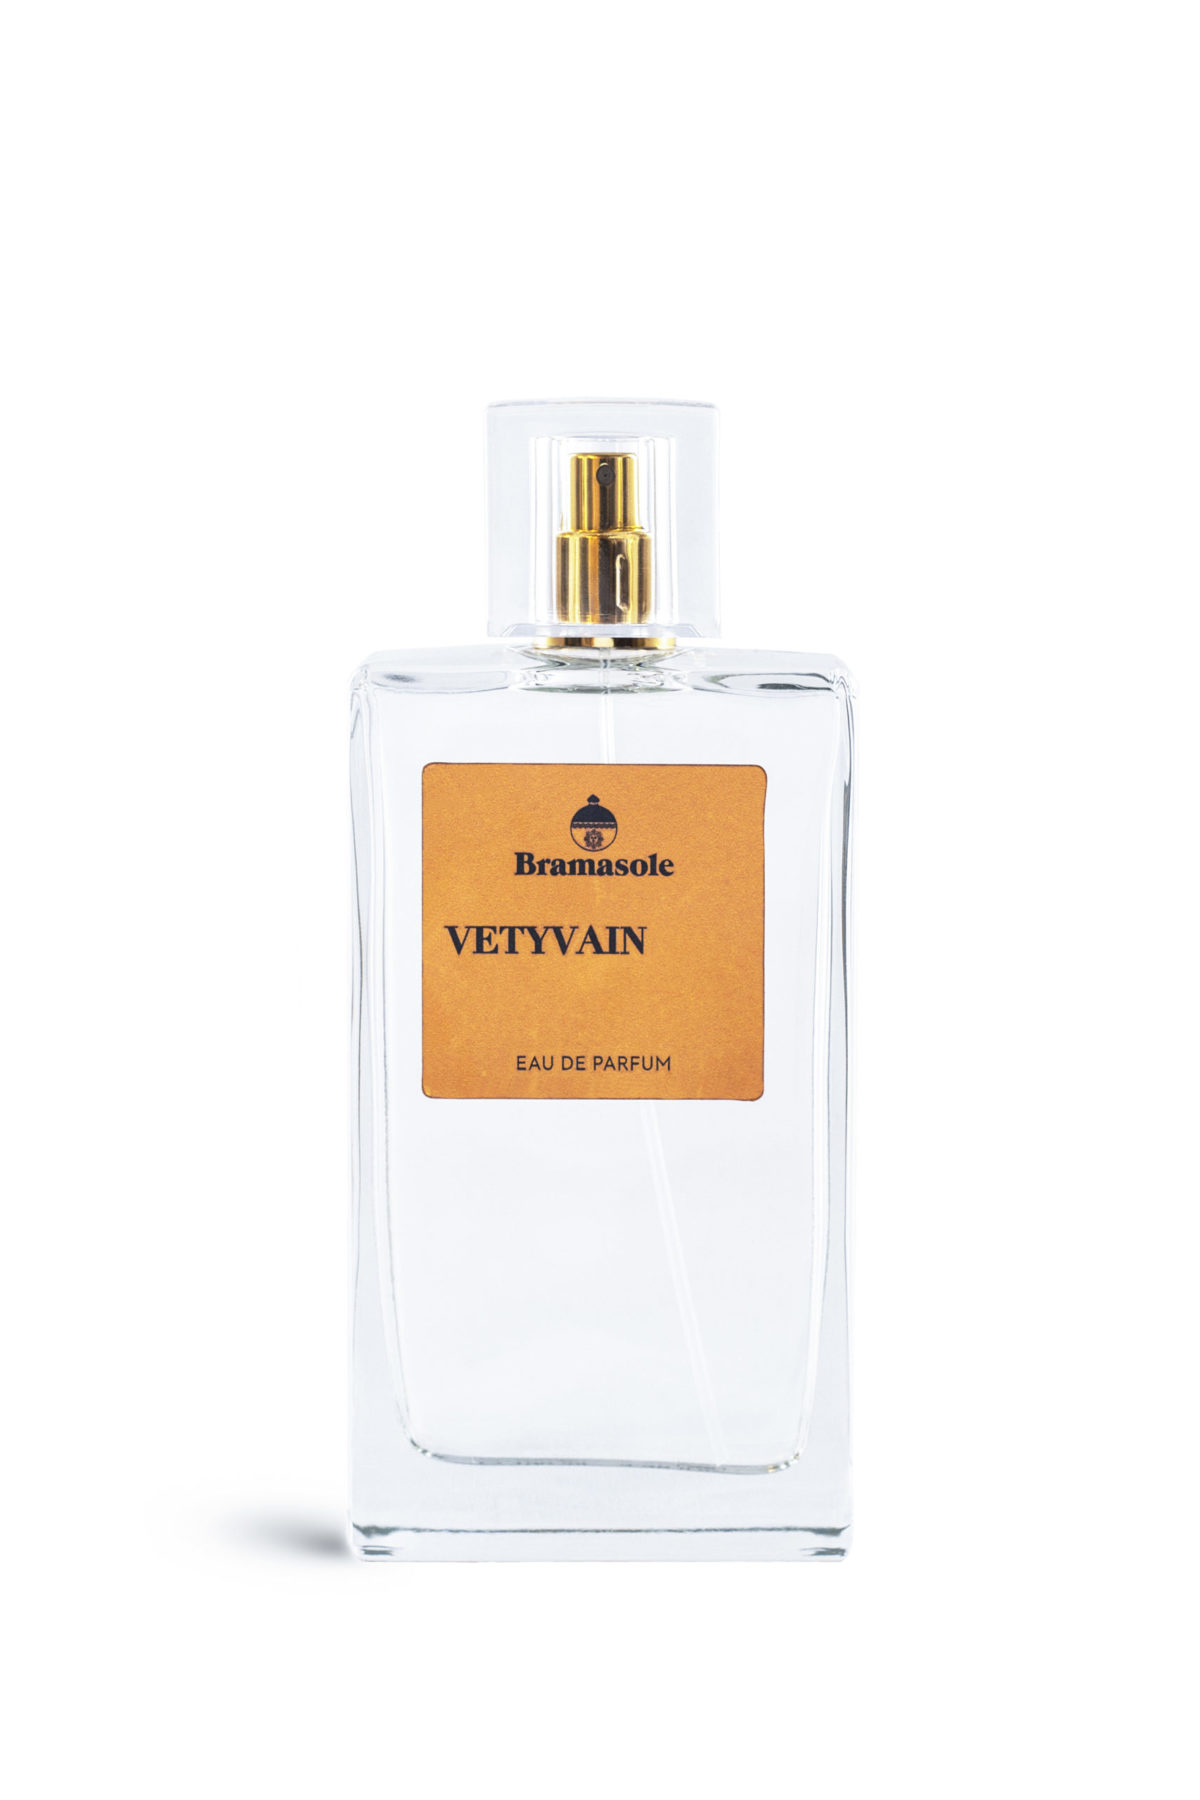 Vetyvain – eau de parfum